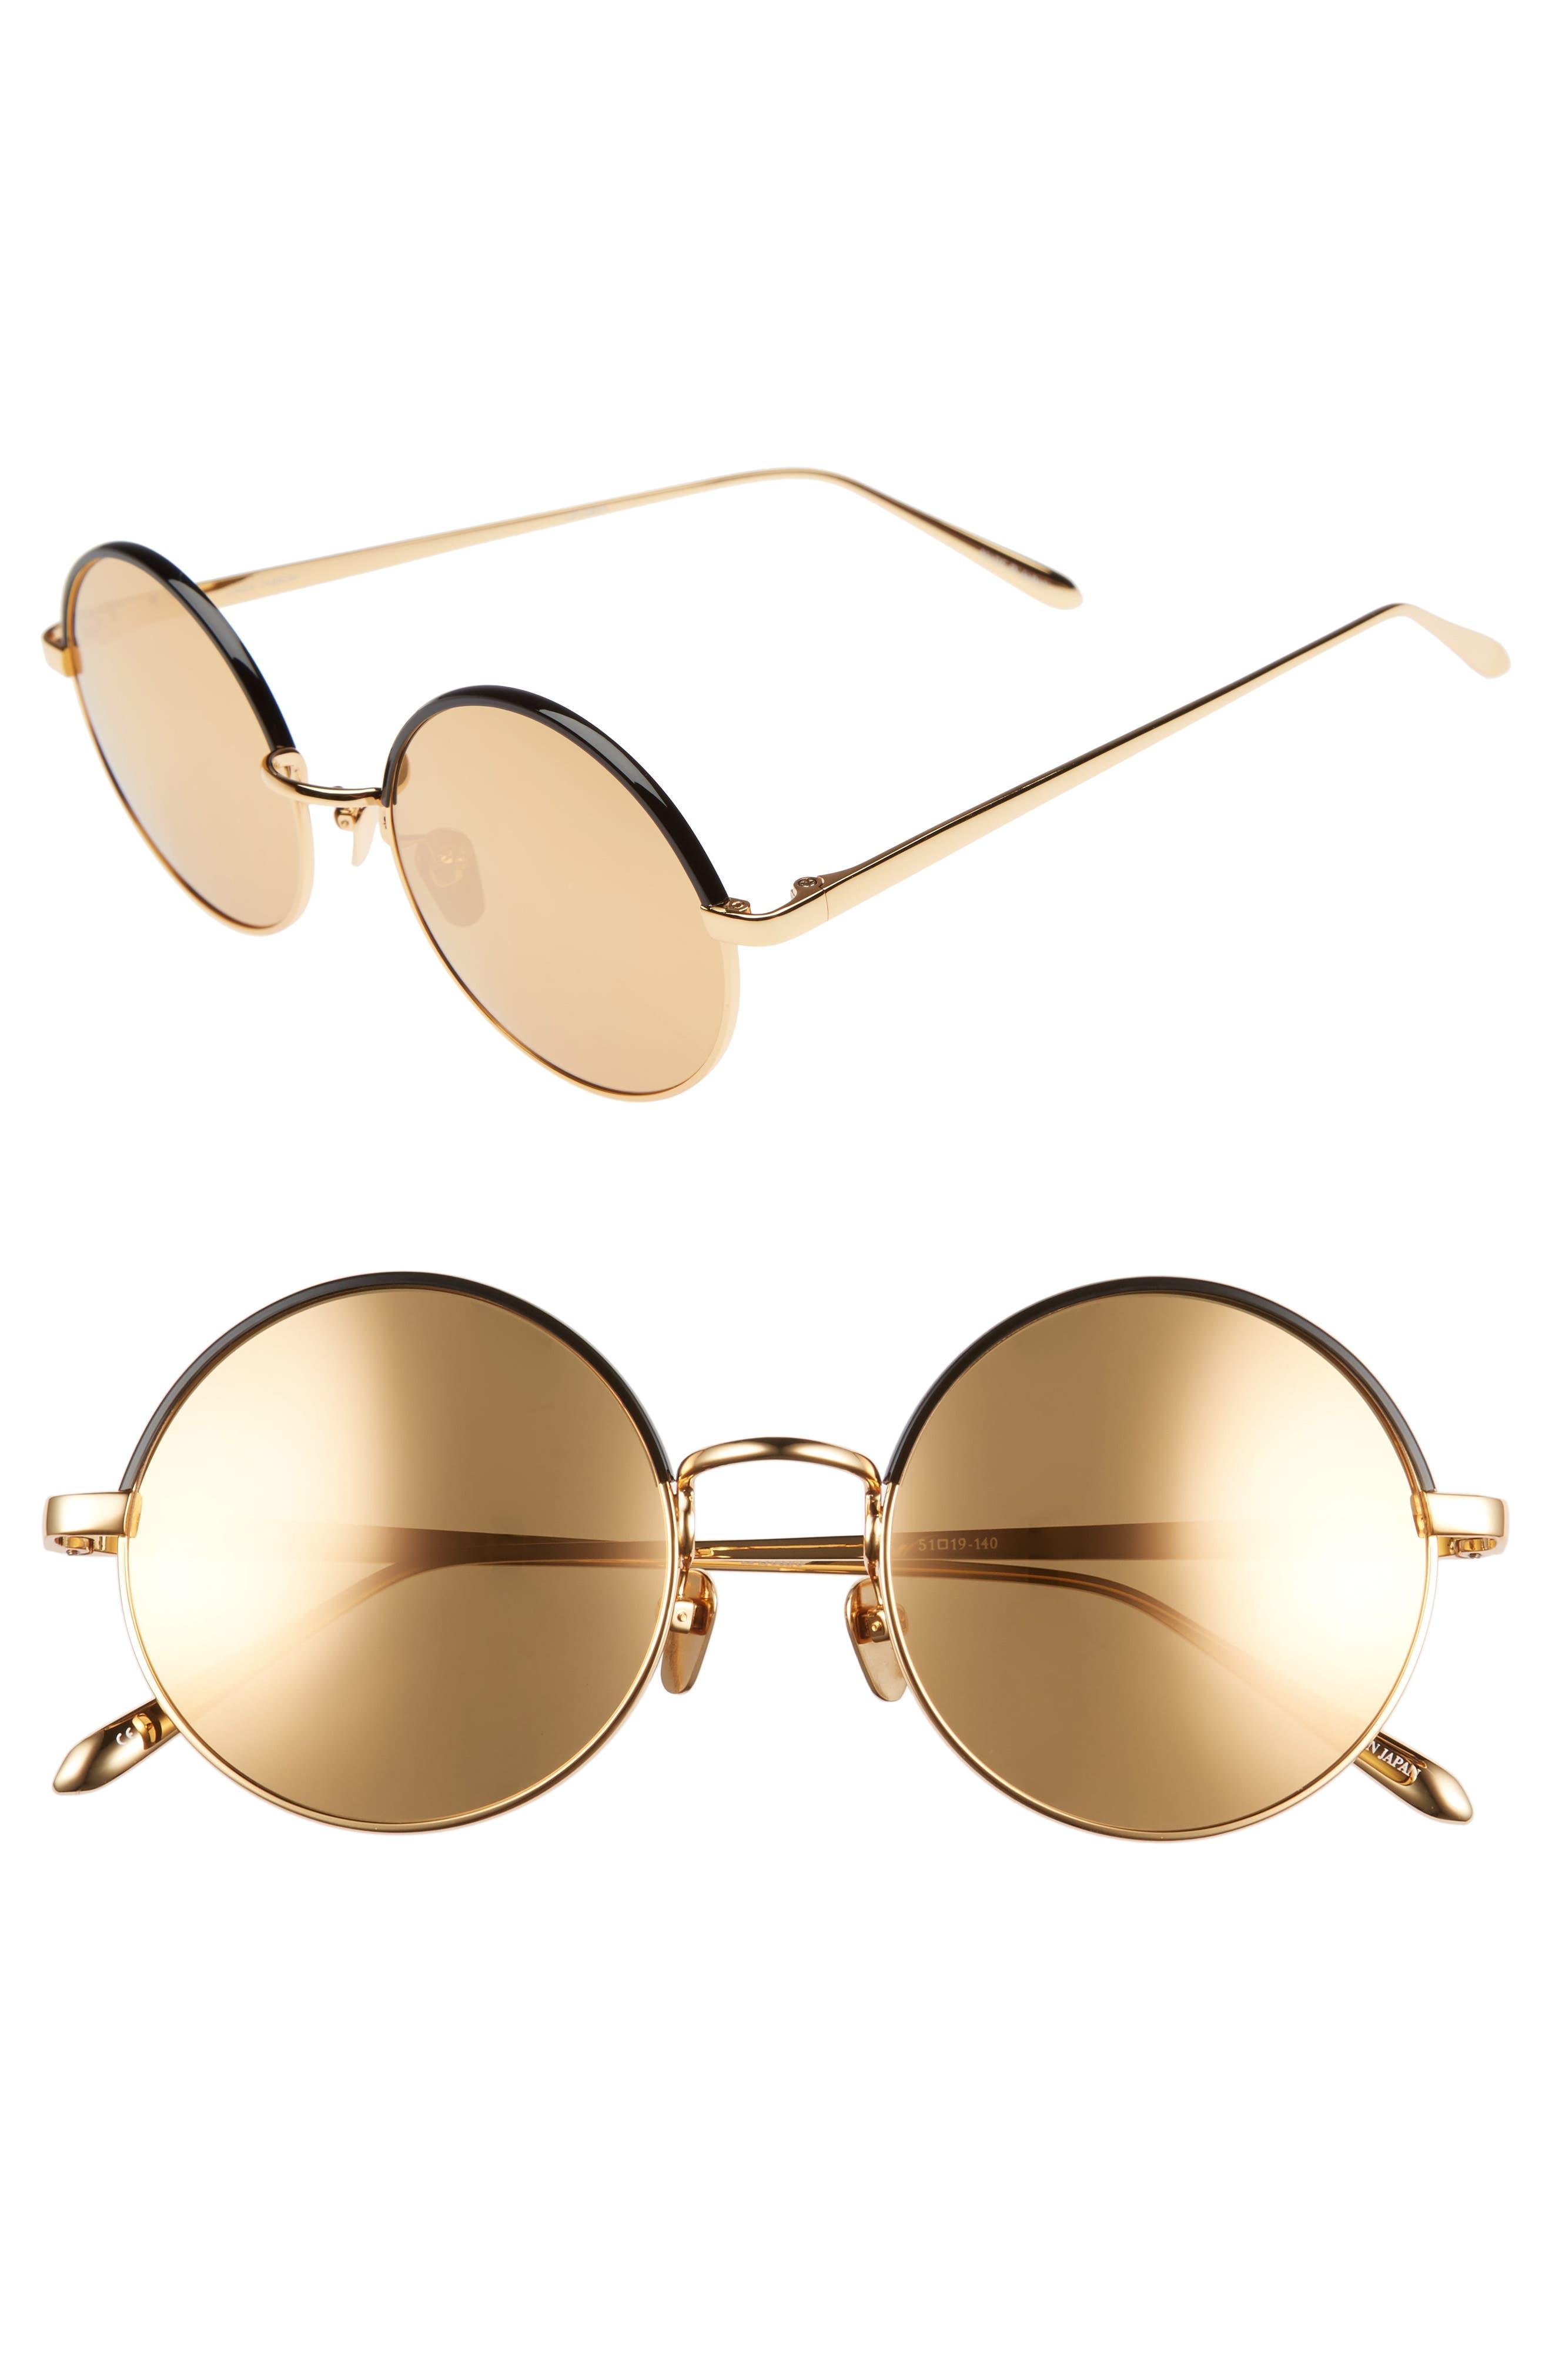 51mm Mirrored 18 Karat Gold Trim Round Sunglasses,                             Main thumbnail 1, color,                             710